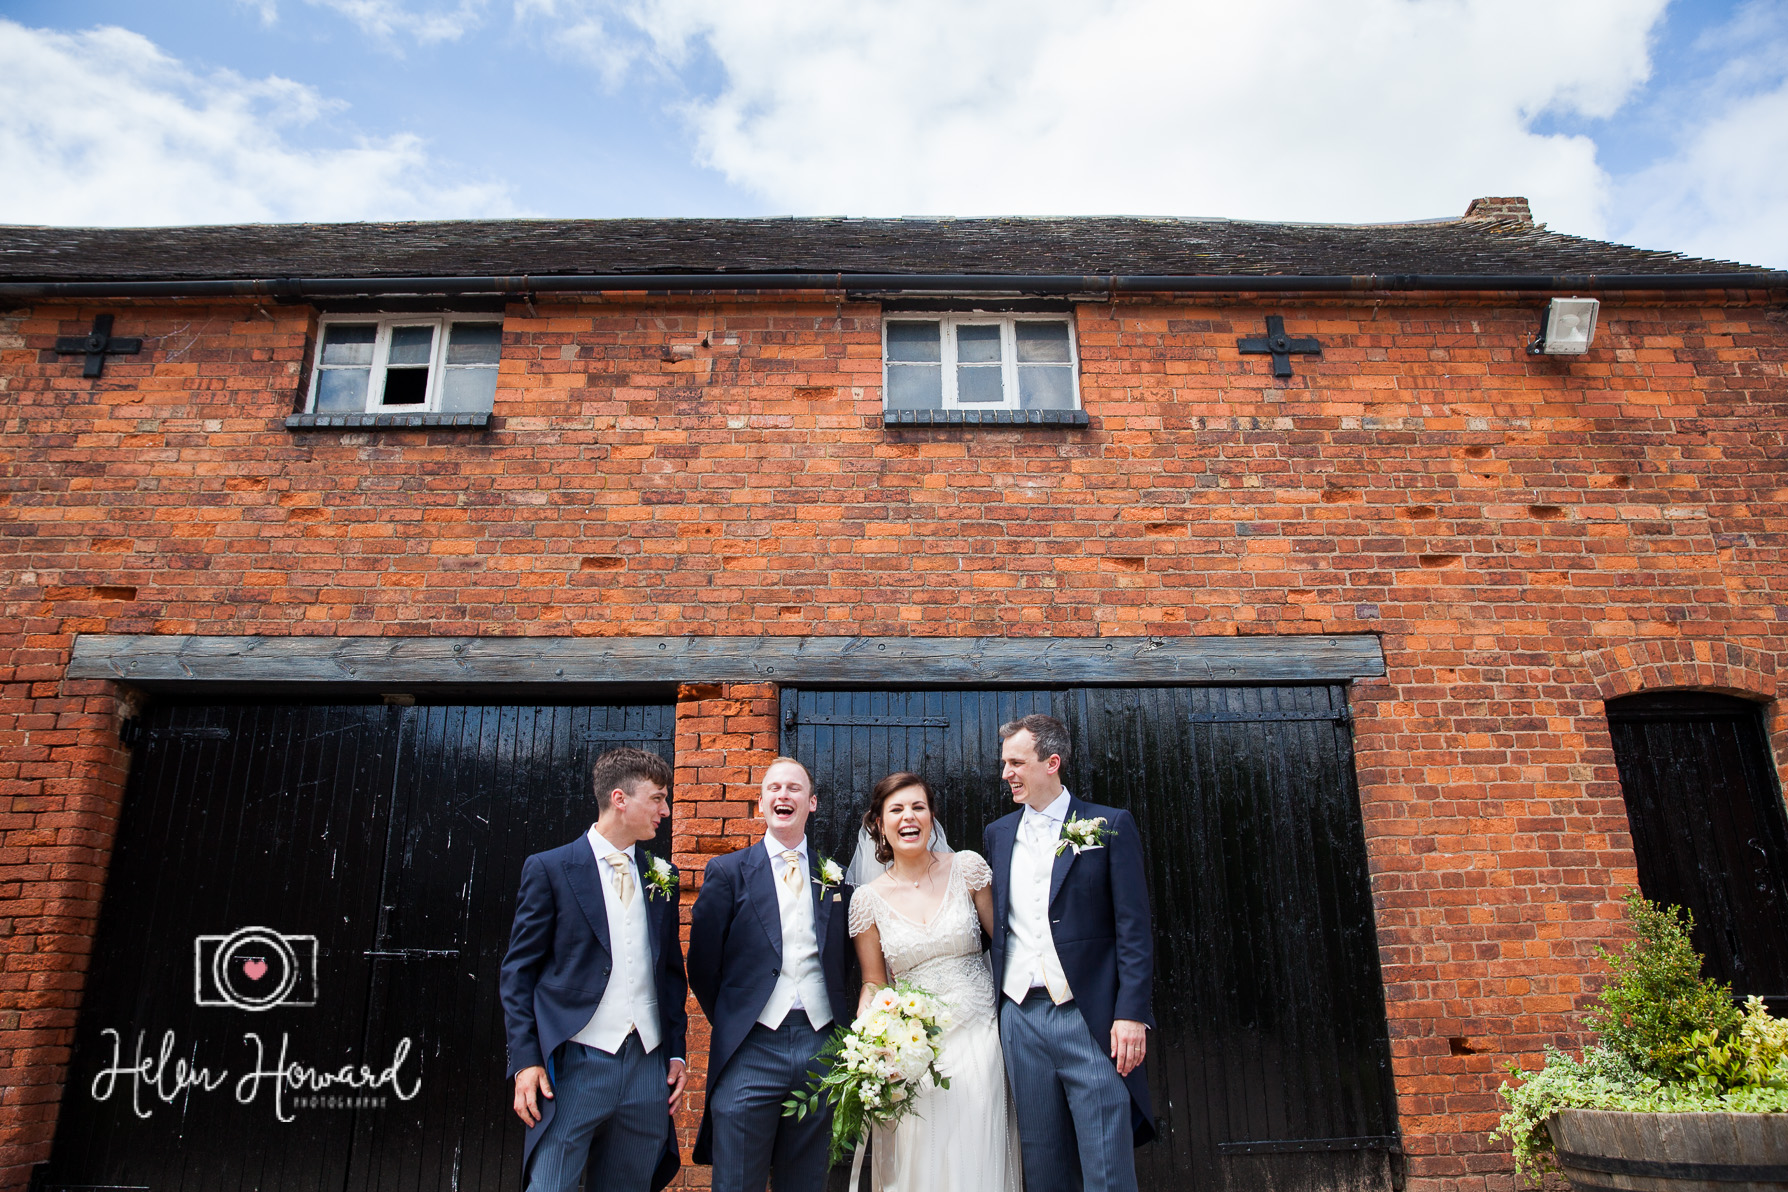 Helen Howard Photography Packington Moor Wedding-75.jpg